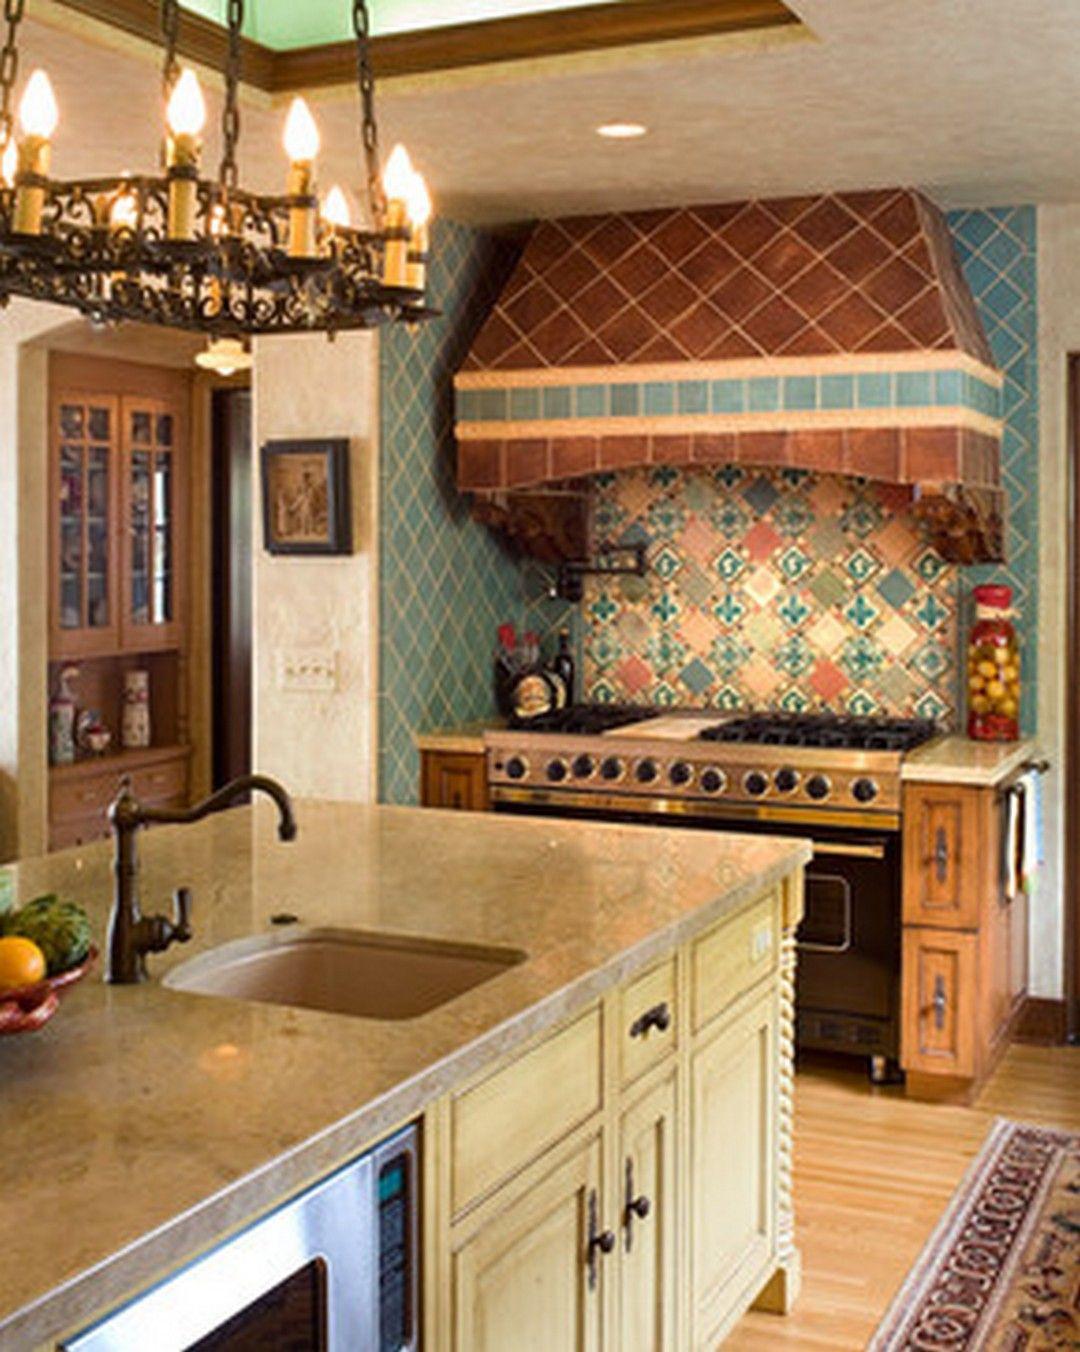 Spanish Style Kitchen Decor Spanish Tile Kitchen Decorating Ideas 99 Gorgeous Photos